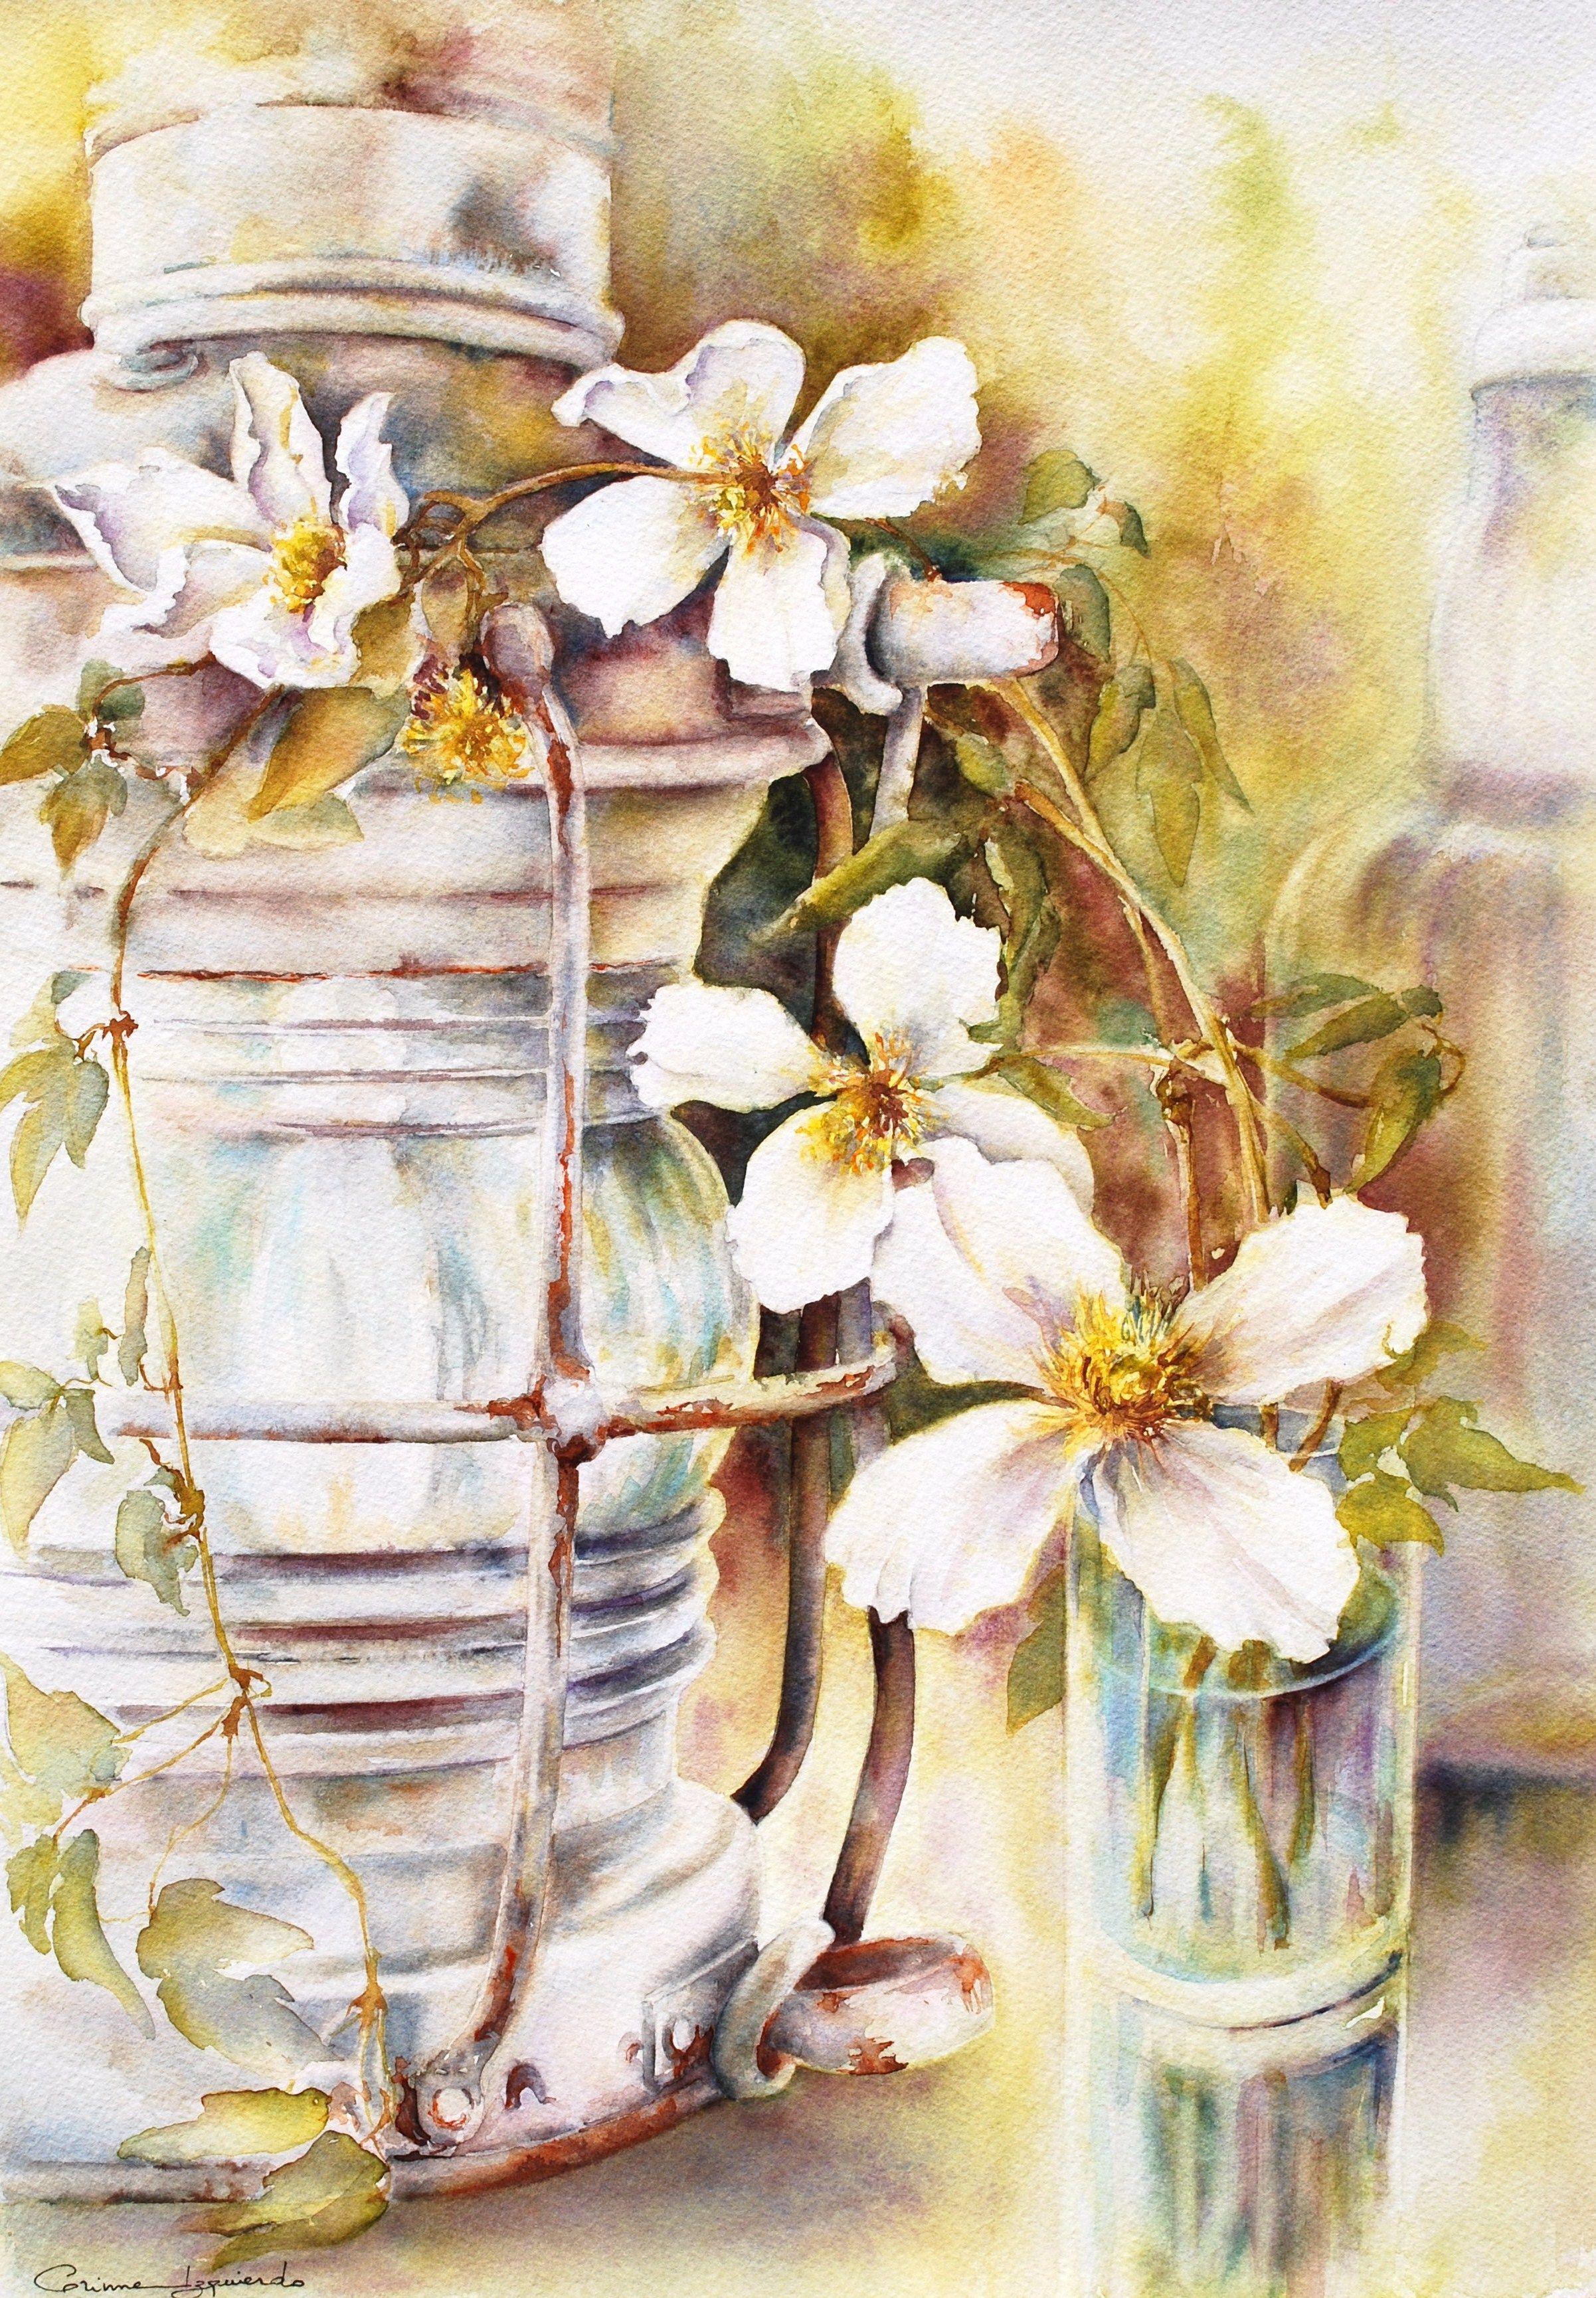 Watercolor By Corinne Izquierdo France Www Corinne Izquierdo Com